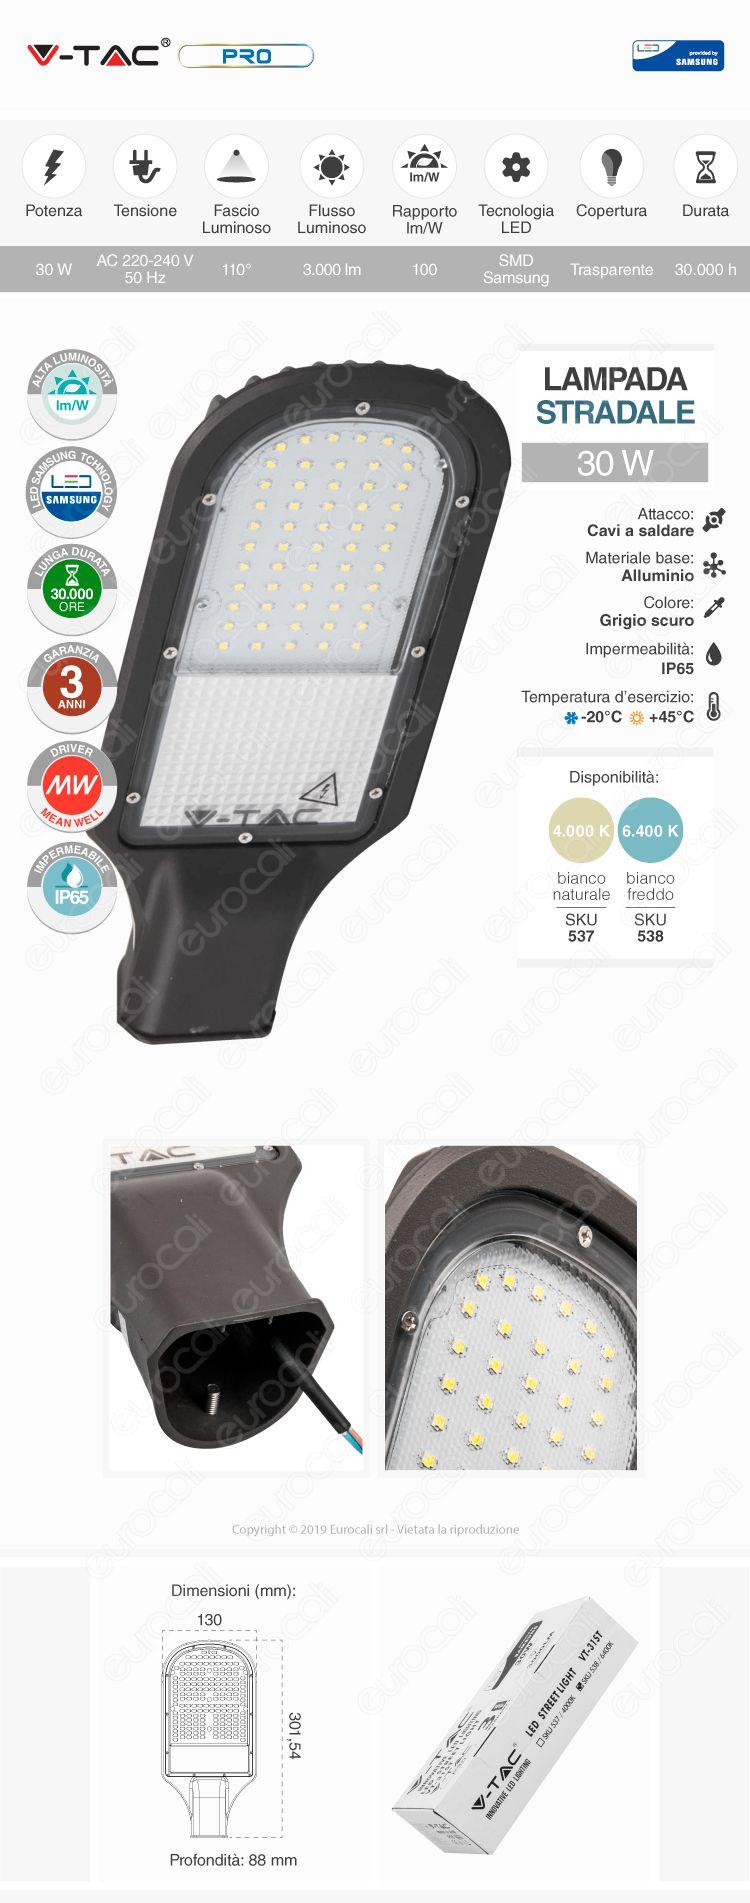 V-Tac PRO VT-31ST Lampada Stradale LED 30W Lampione SMD Chip Samsung